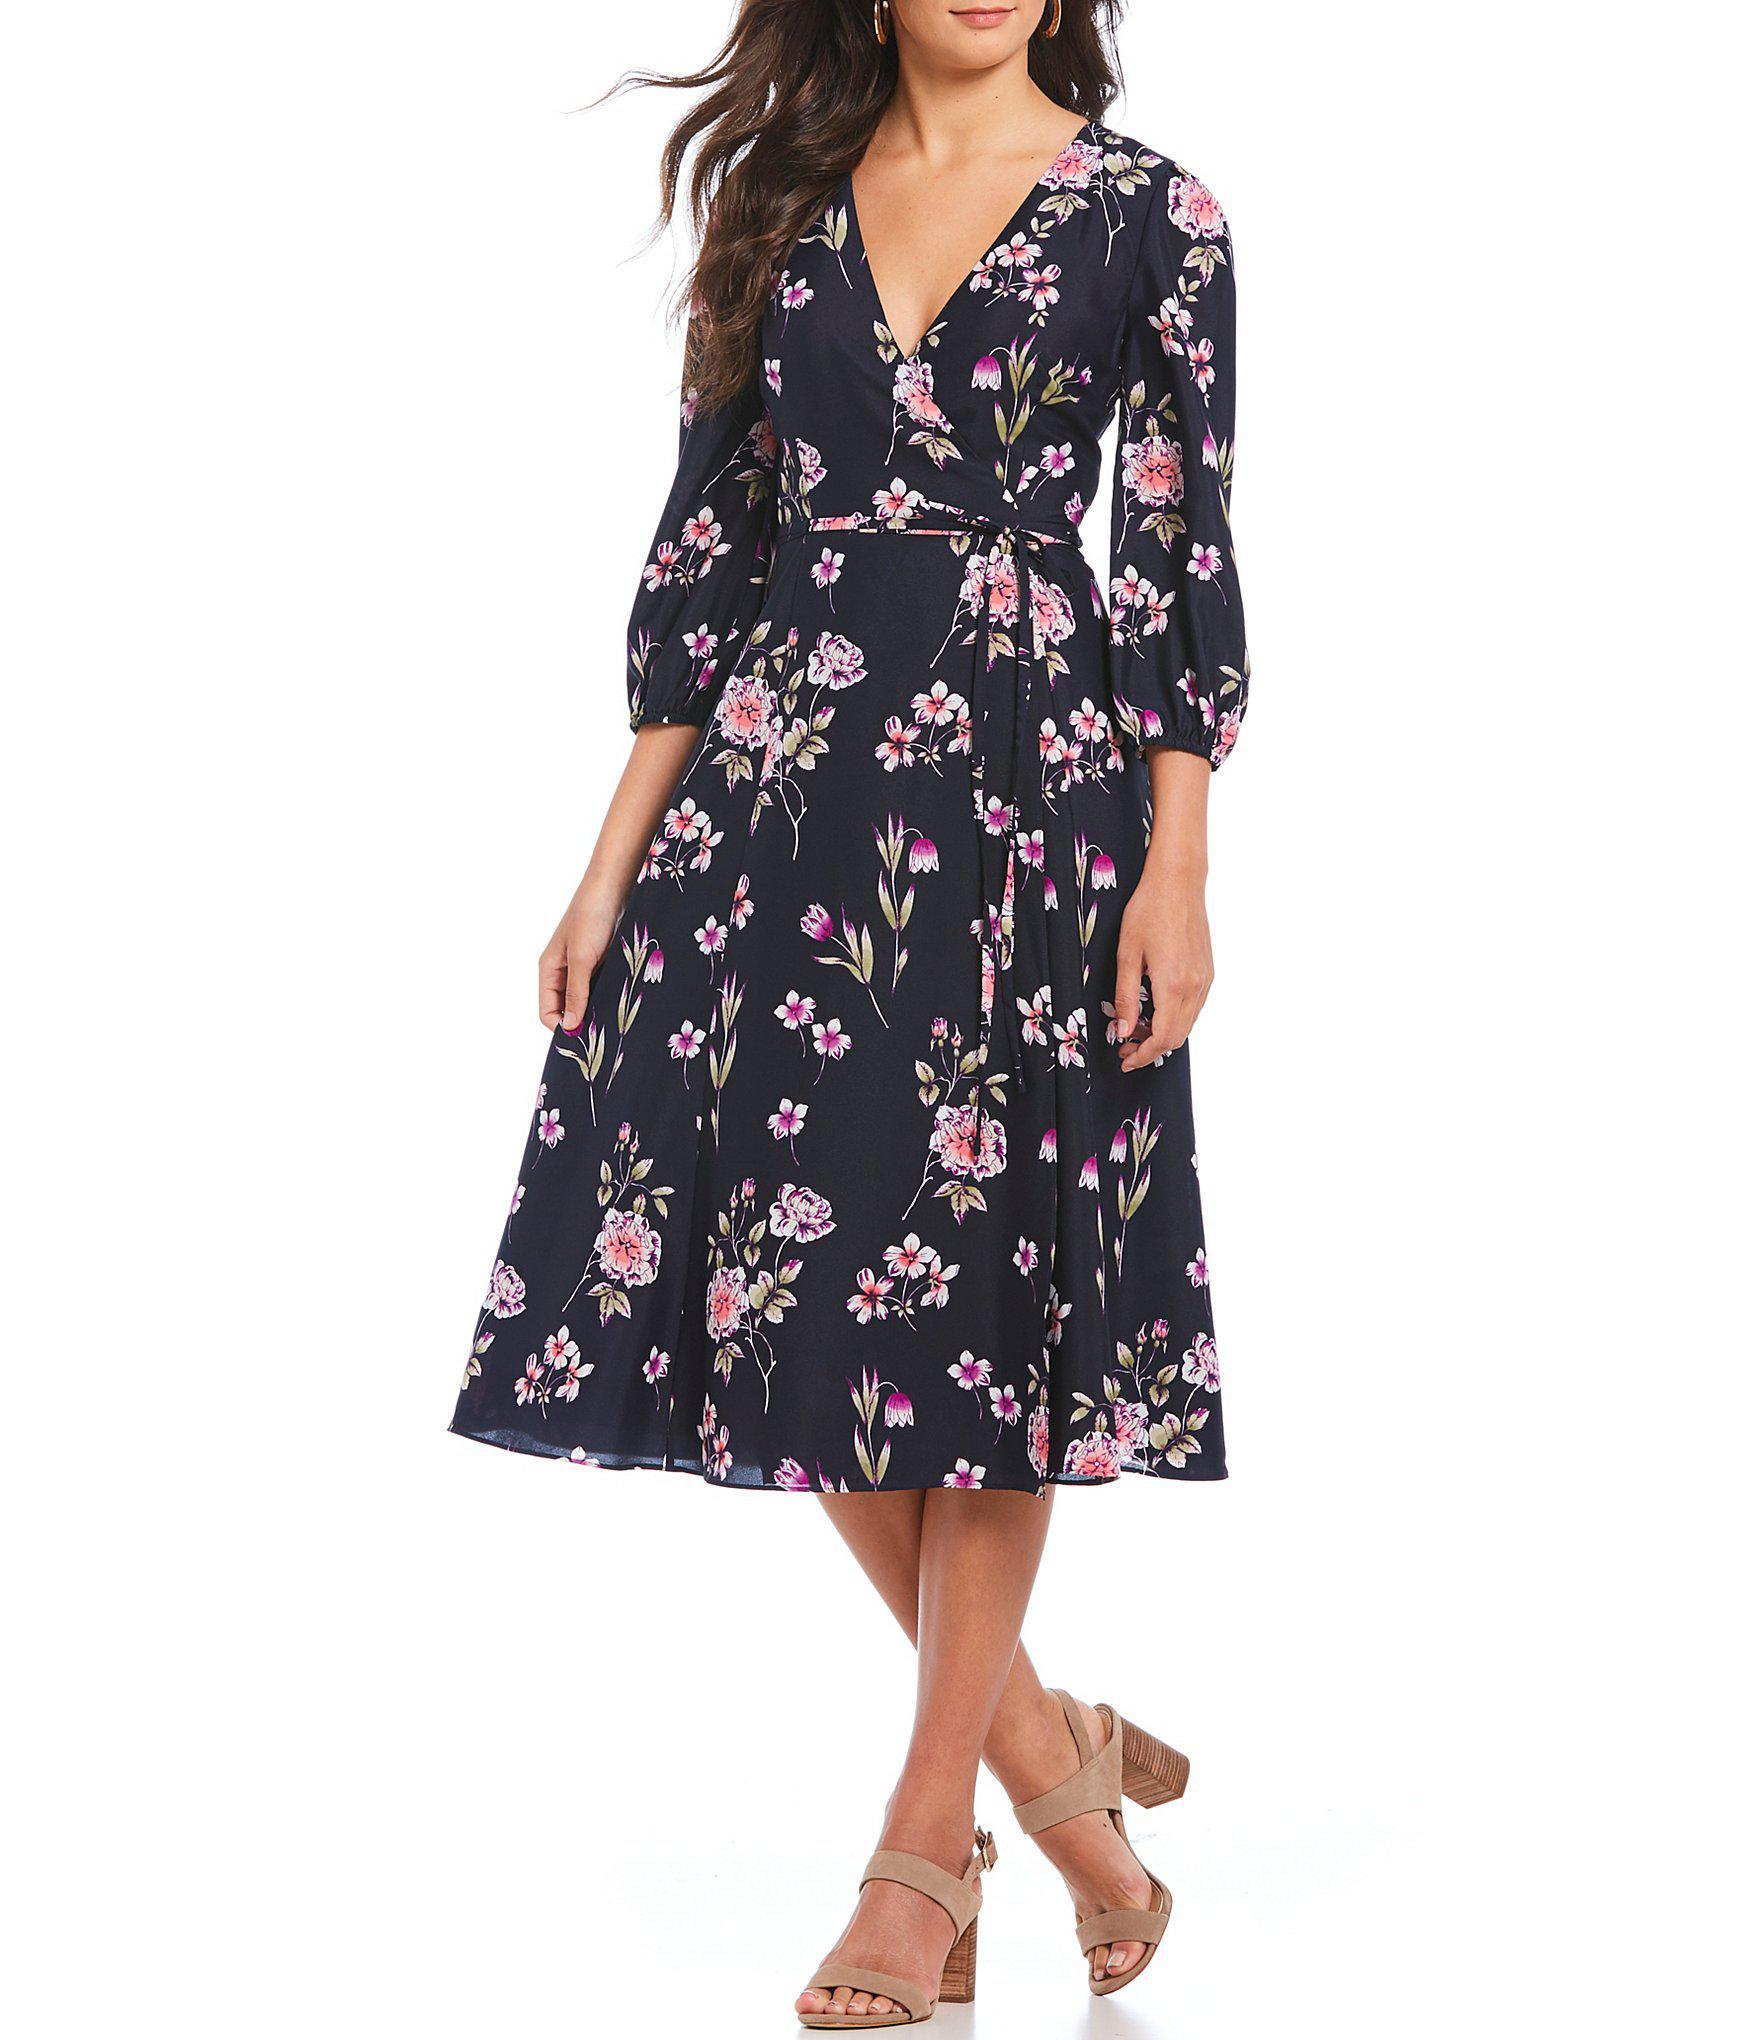 625ef3982c6b Lyst - Eliza J Floral Print Faux Wrap Style Midi Dress in Blue